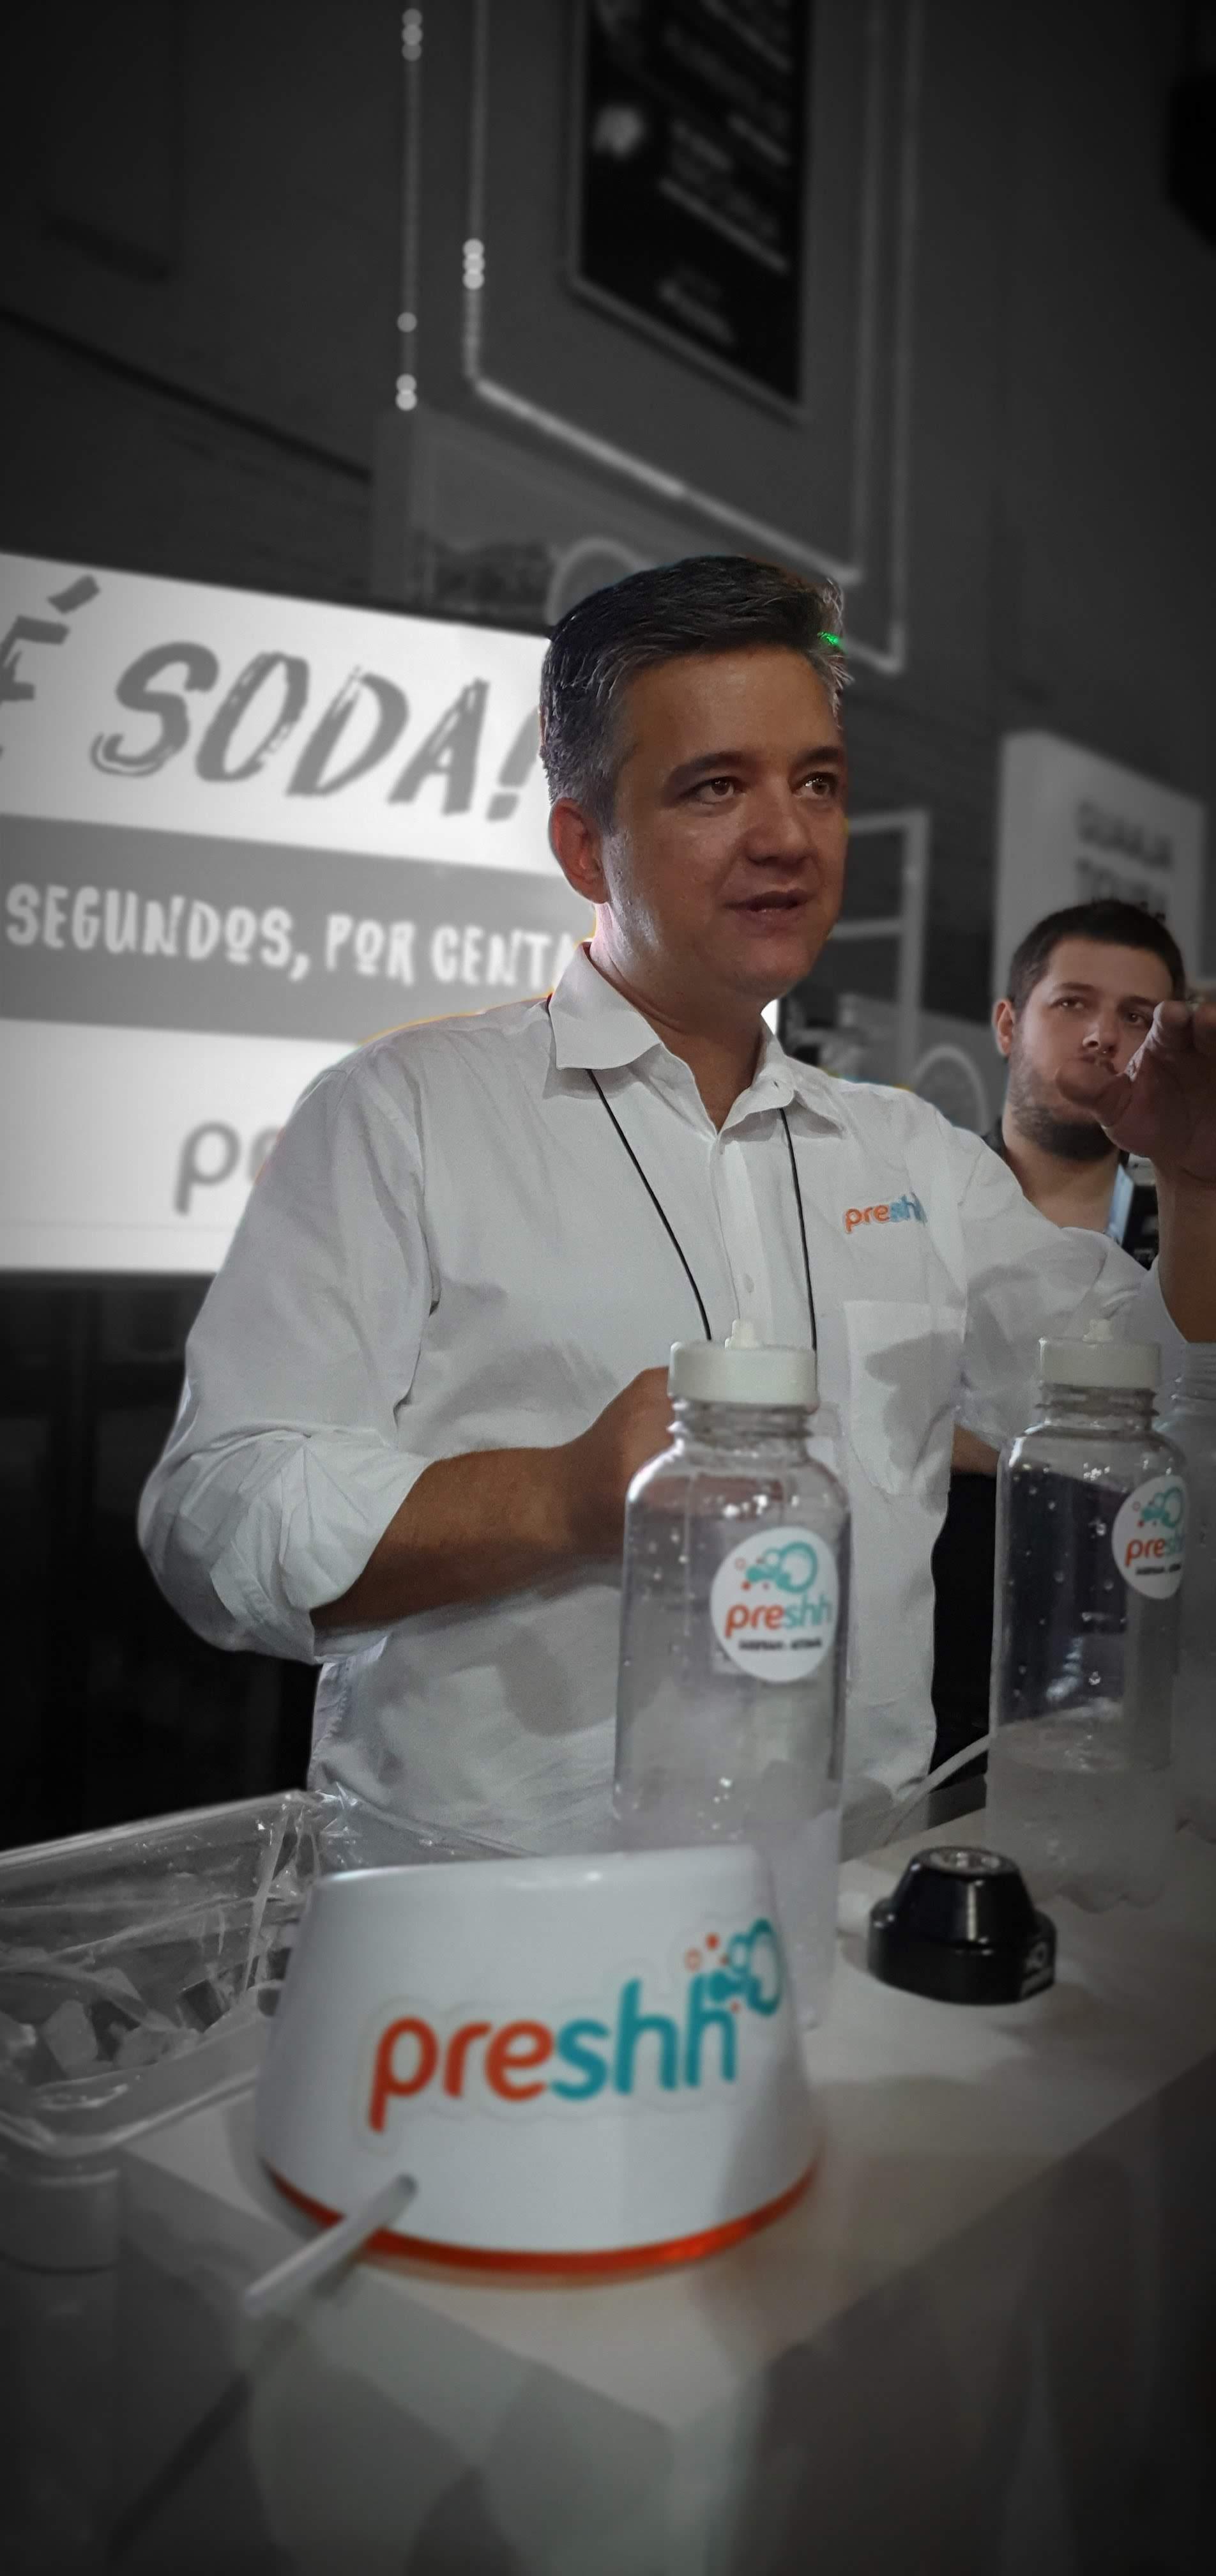 Leopoldo (Presh) - Bar Convent São Paulo 2019